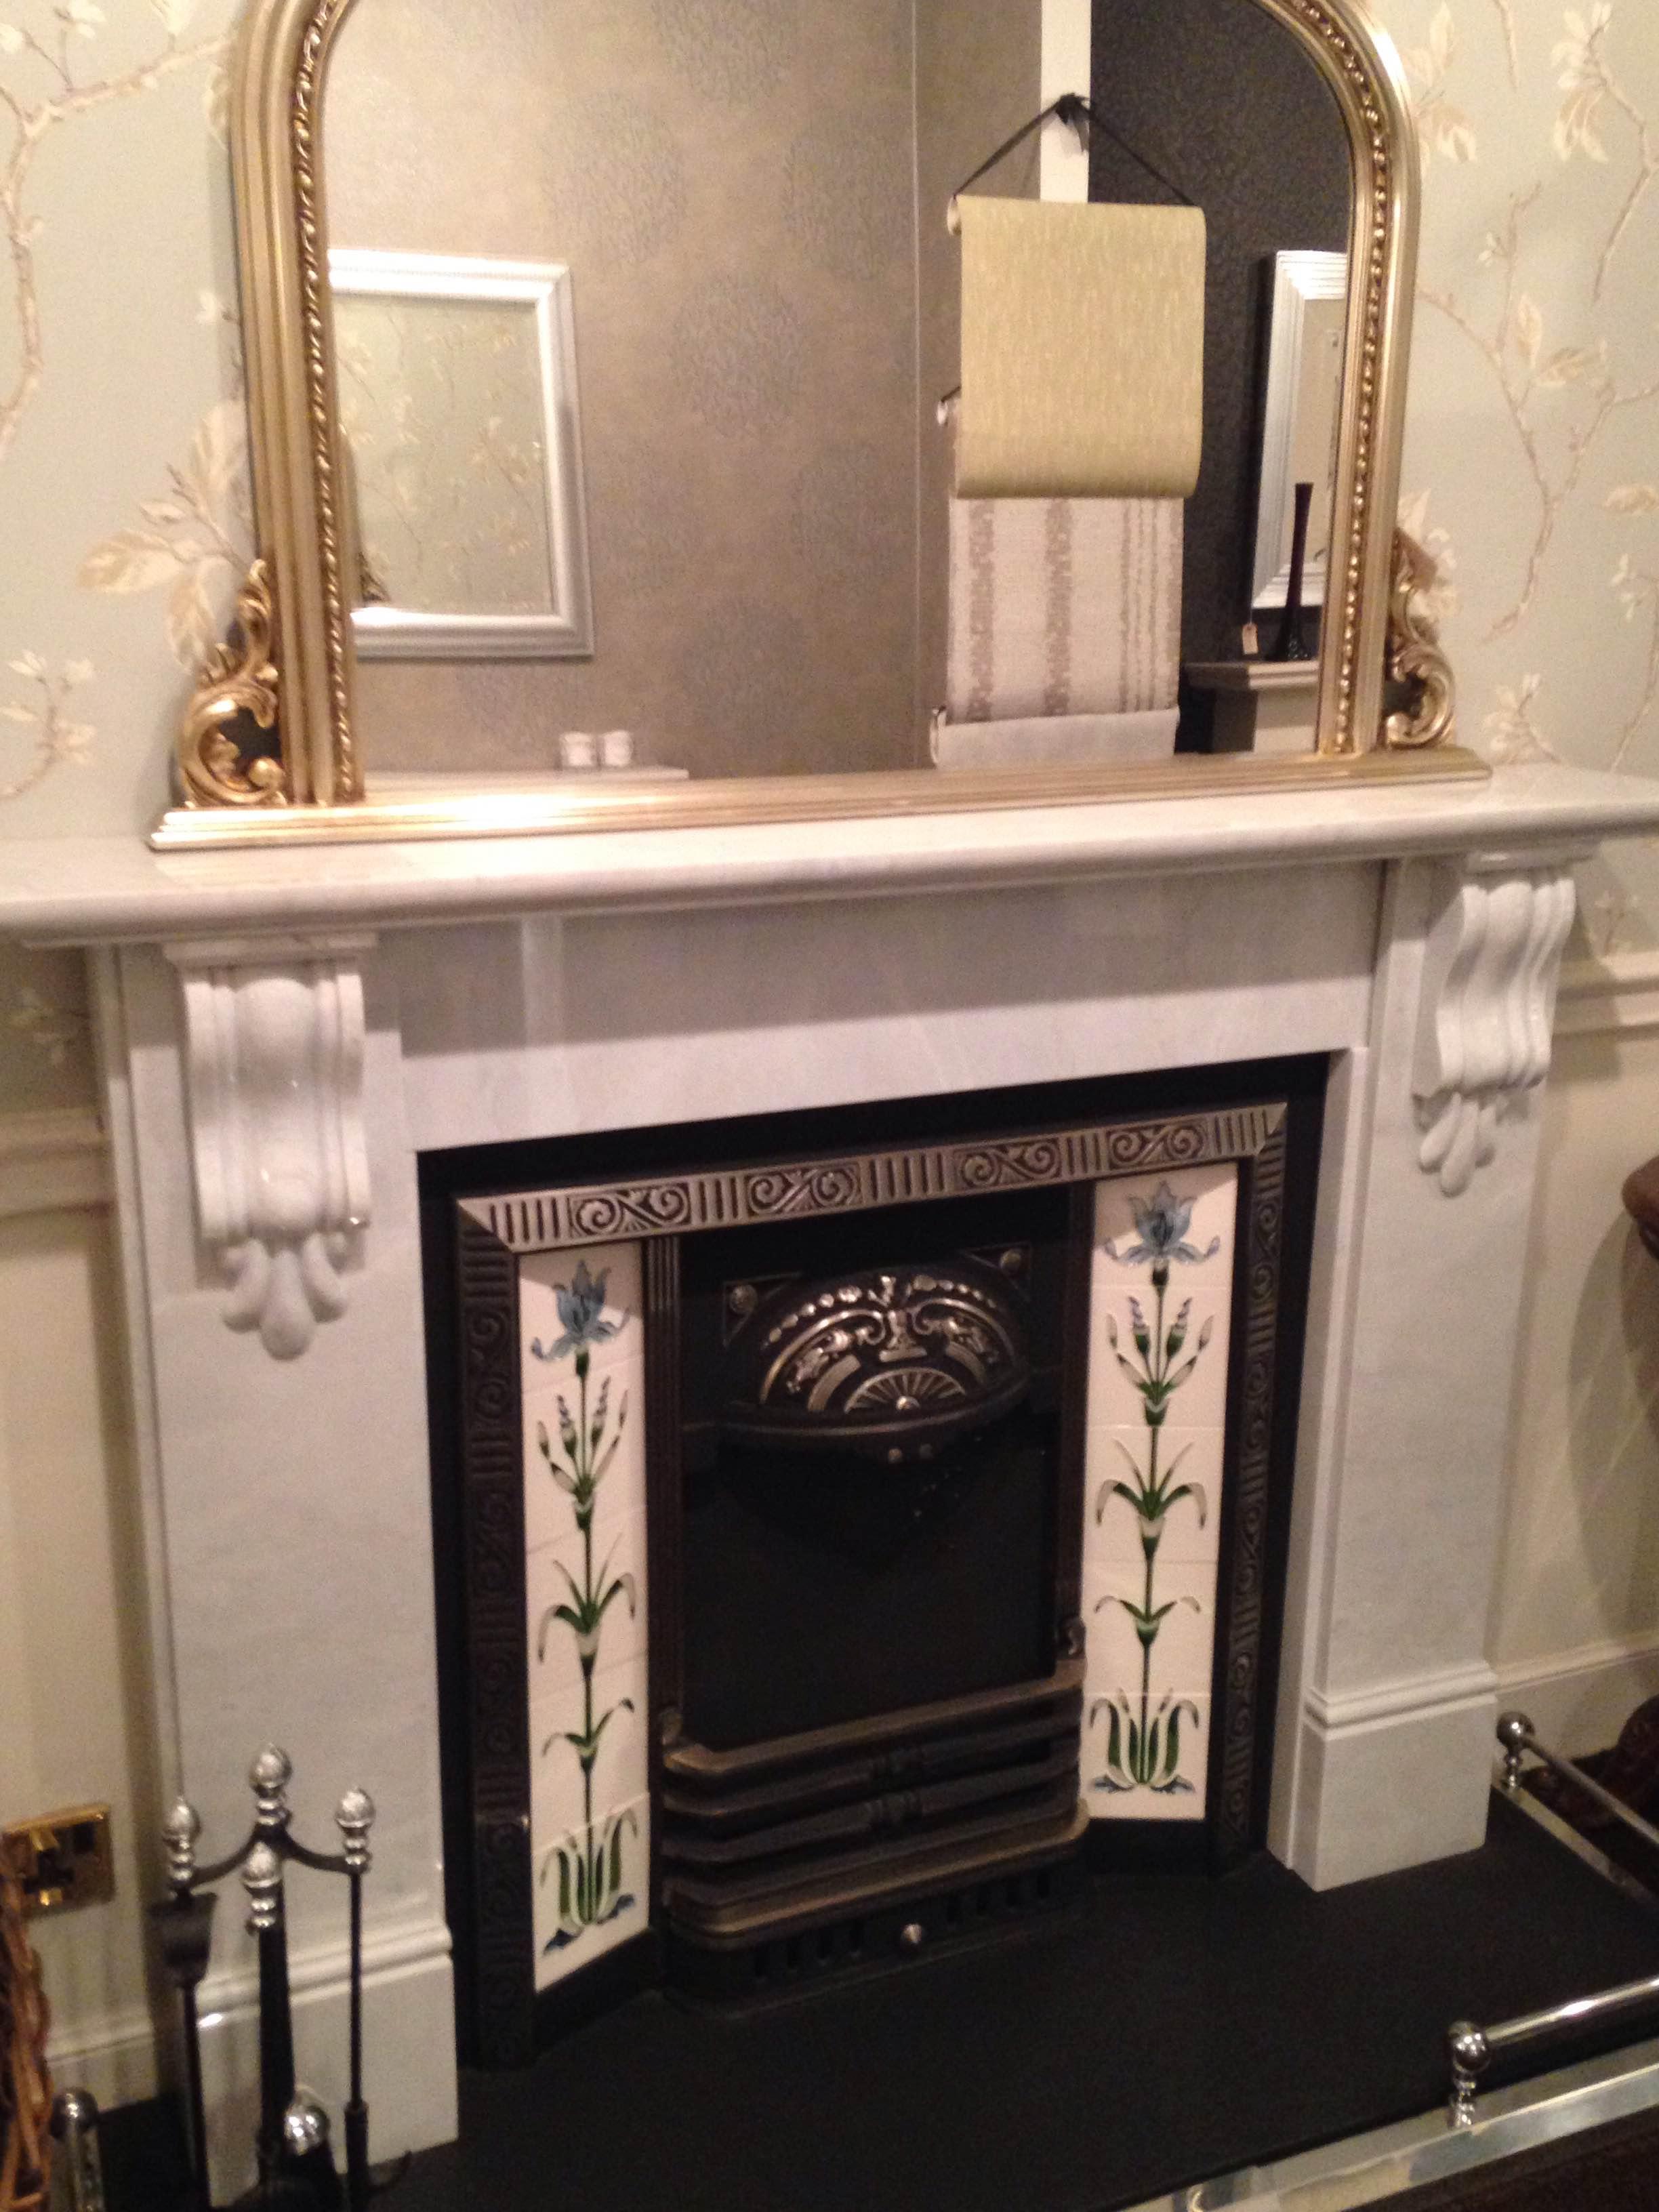 hota back wilsons product panel fireplace fireplaces ariston carrara victorian flat